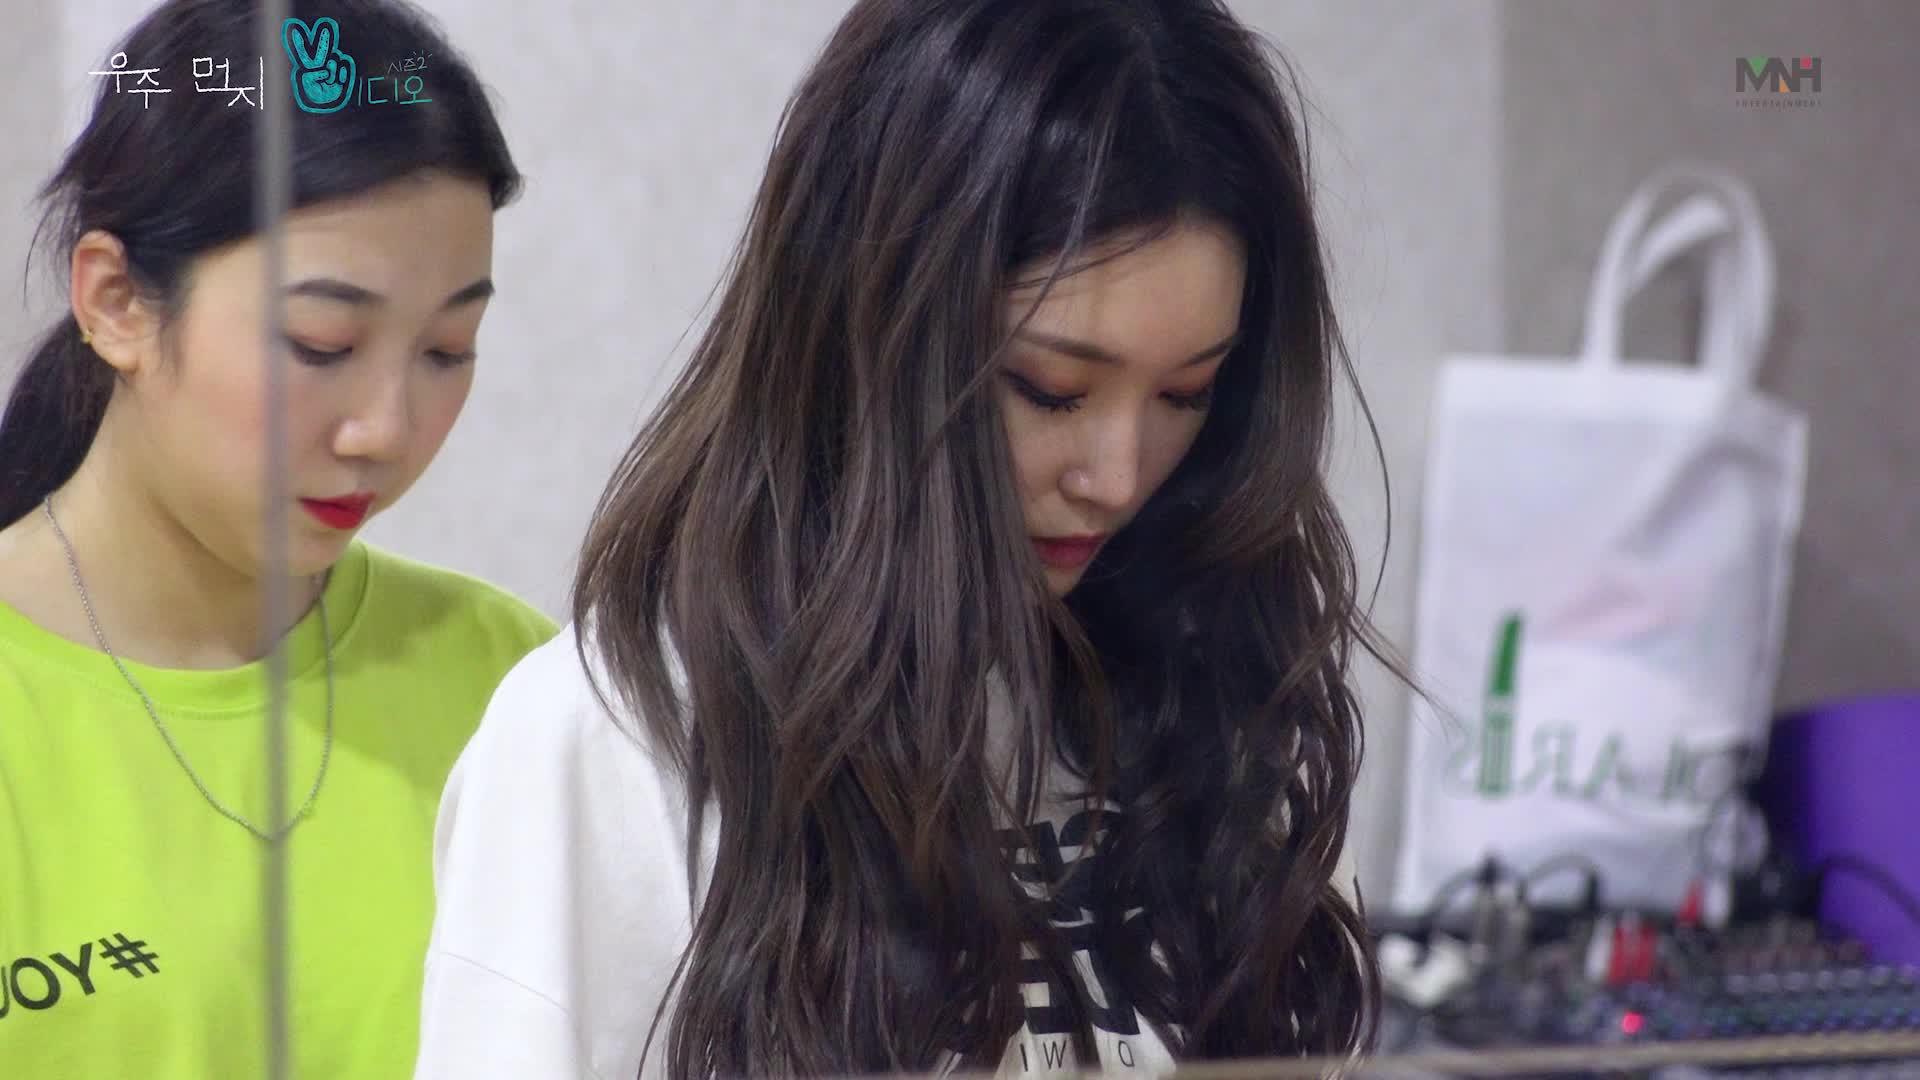 [C.D.V.시즌2] 우주먼지비디오 28편 - 불후의 명곡 (스페셜러닝타임)